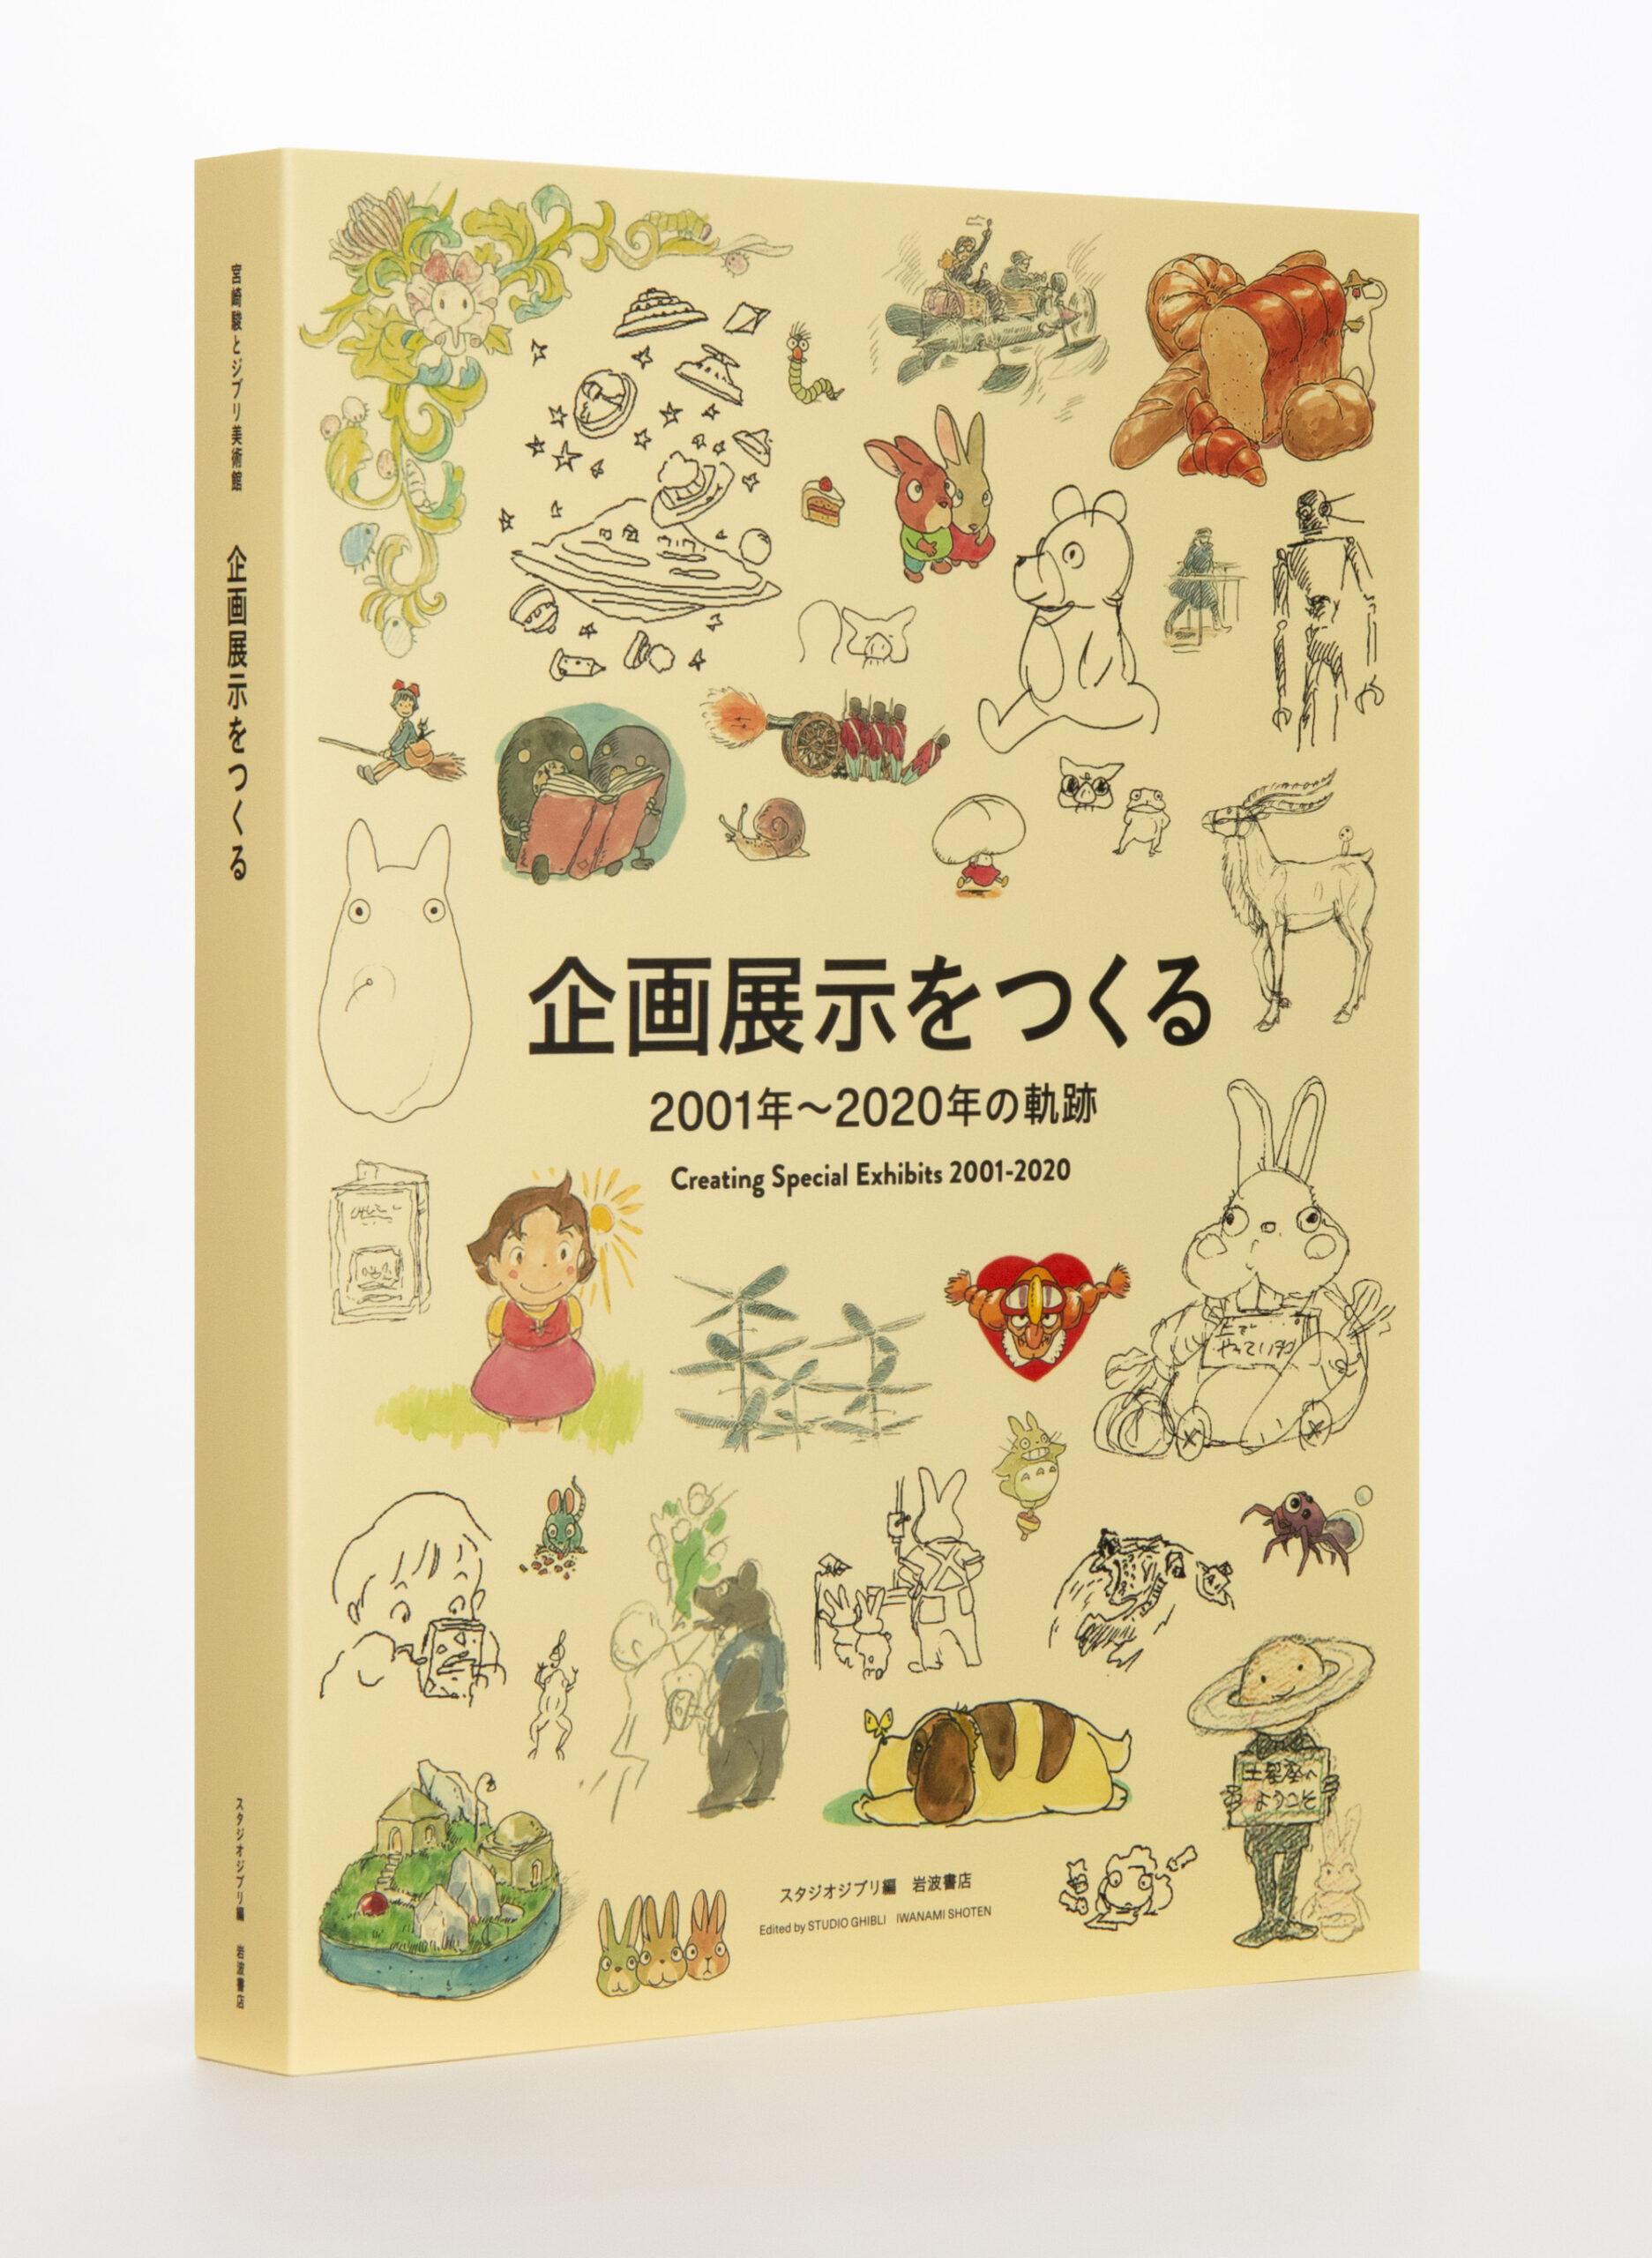 Creating Exibits 2001-2020. © 2021 Studio Ghibli © Museo d'Arte Ghibli. Published by Iwanami Shoten, Publishers, Tokyo